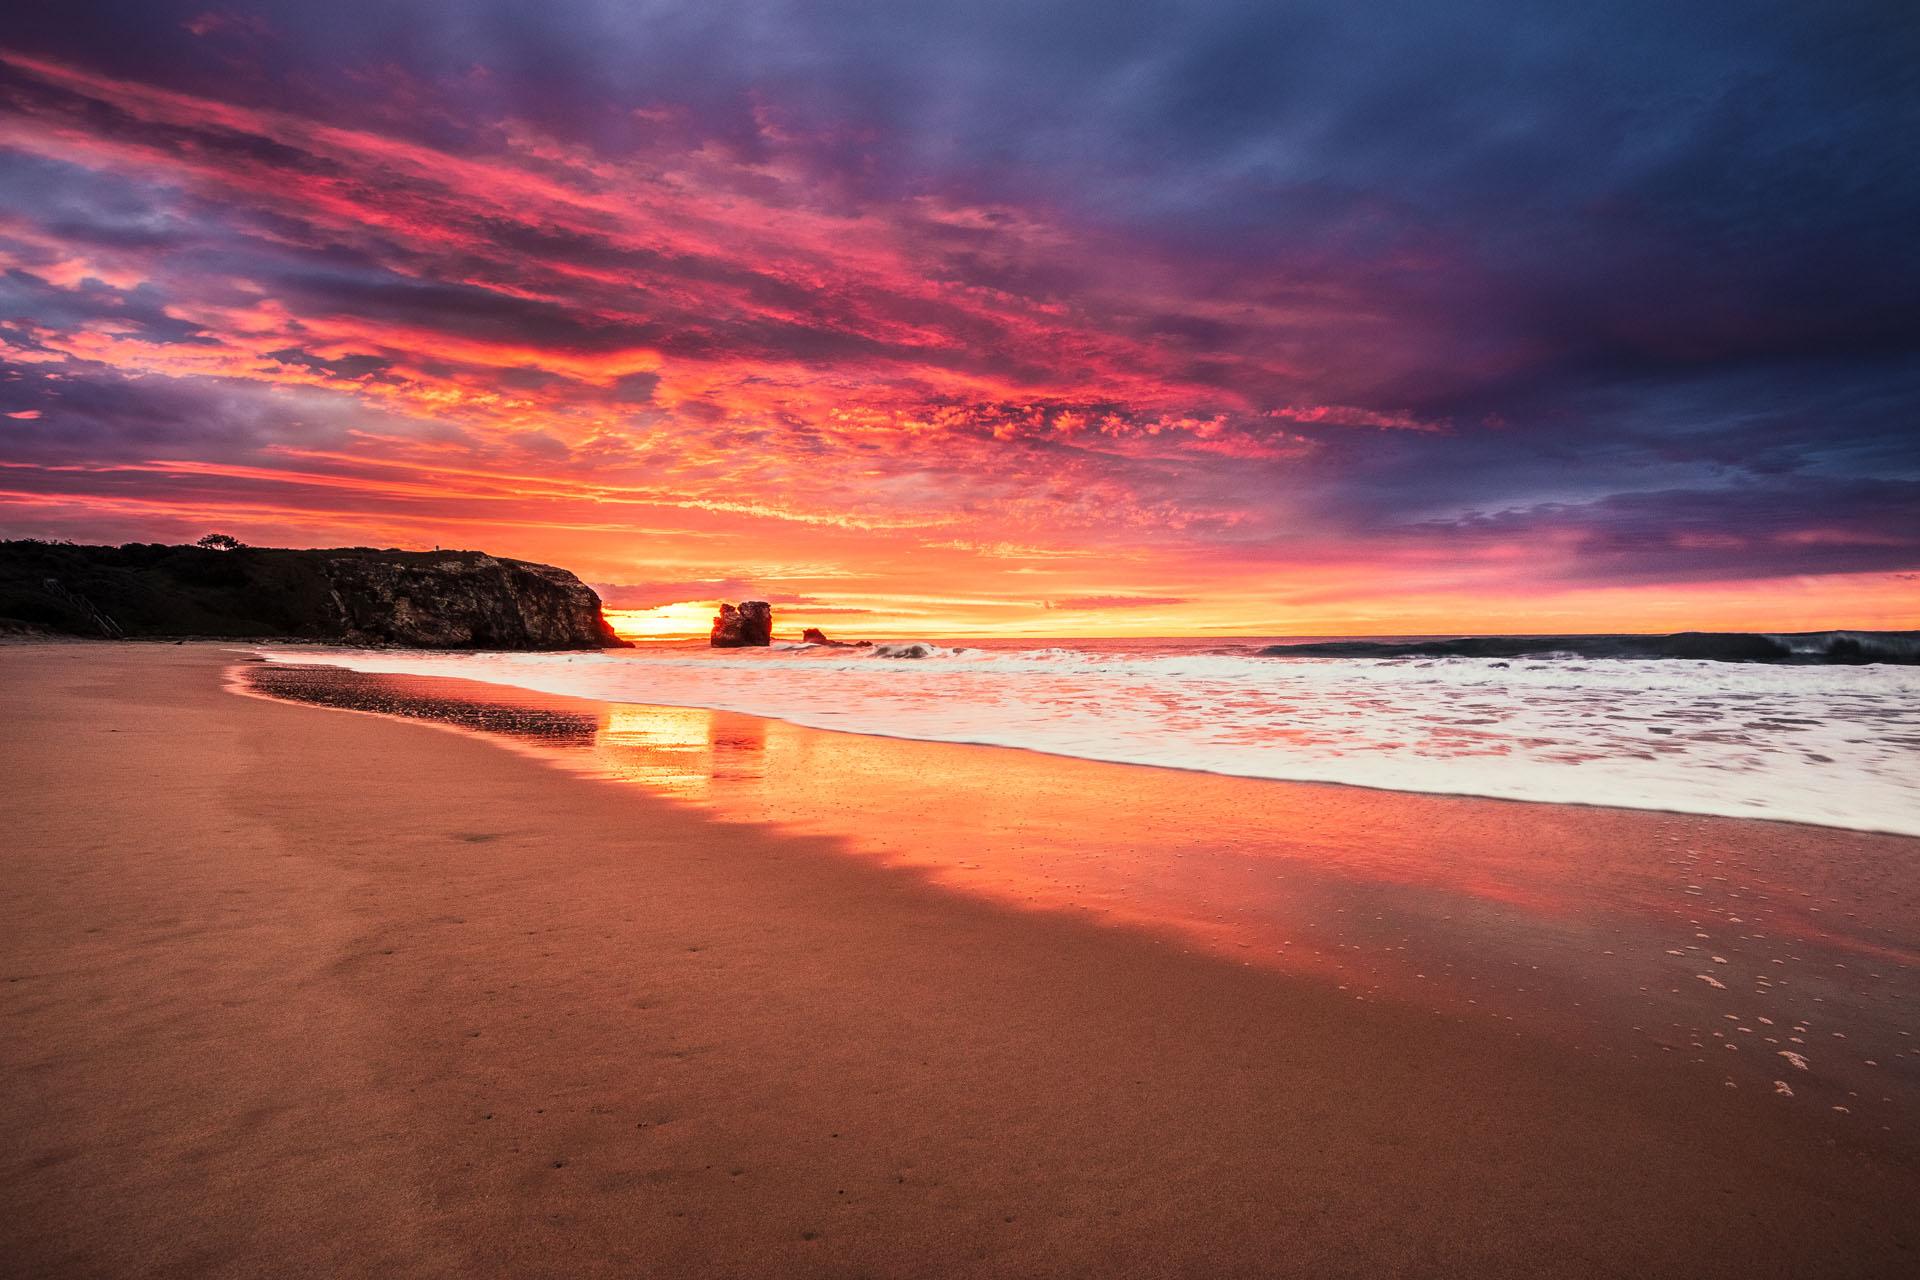 Vibrant Red Rock sunrise - Franzi Photography